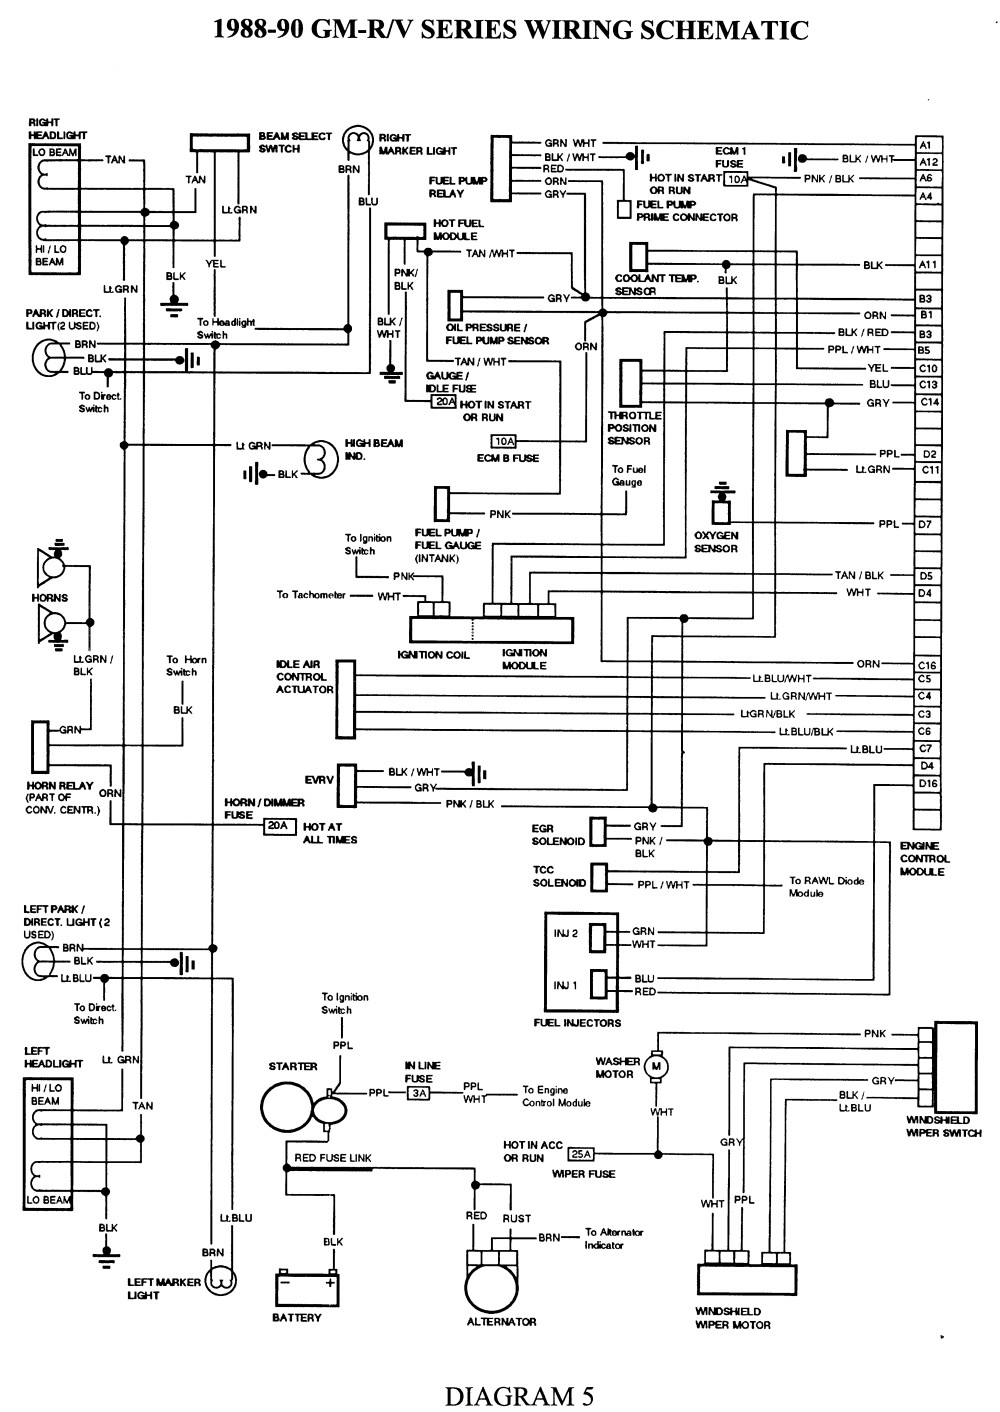 95 F150 Fuel Pump Wiring Diagram 1988 Suburban Wiring Diagram Wiring Diagram U2022 Rh Championapp